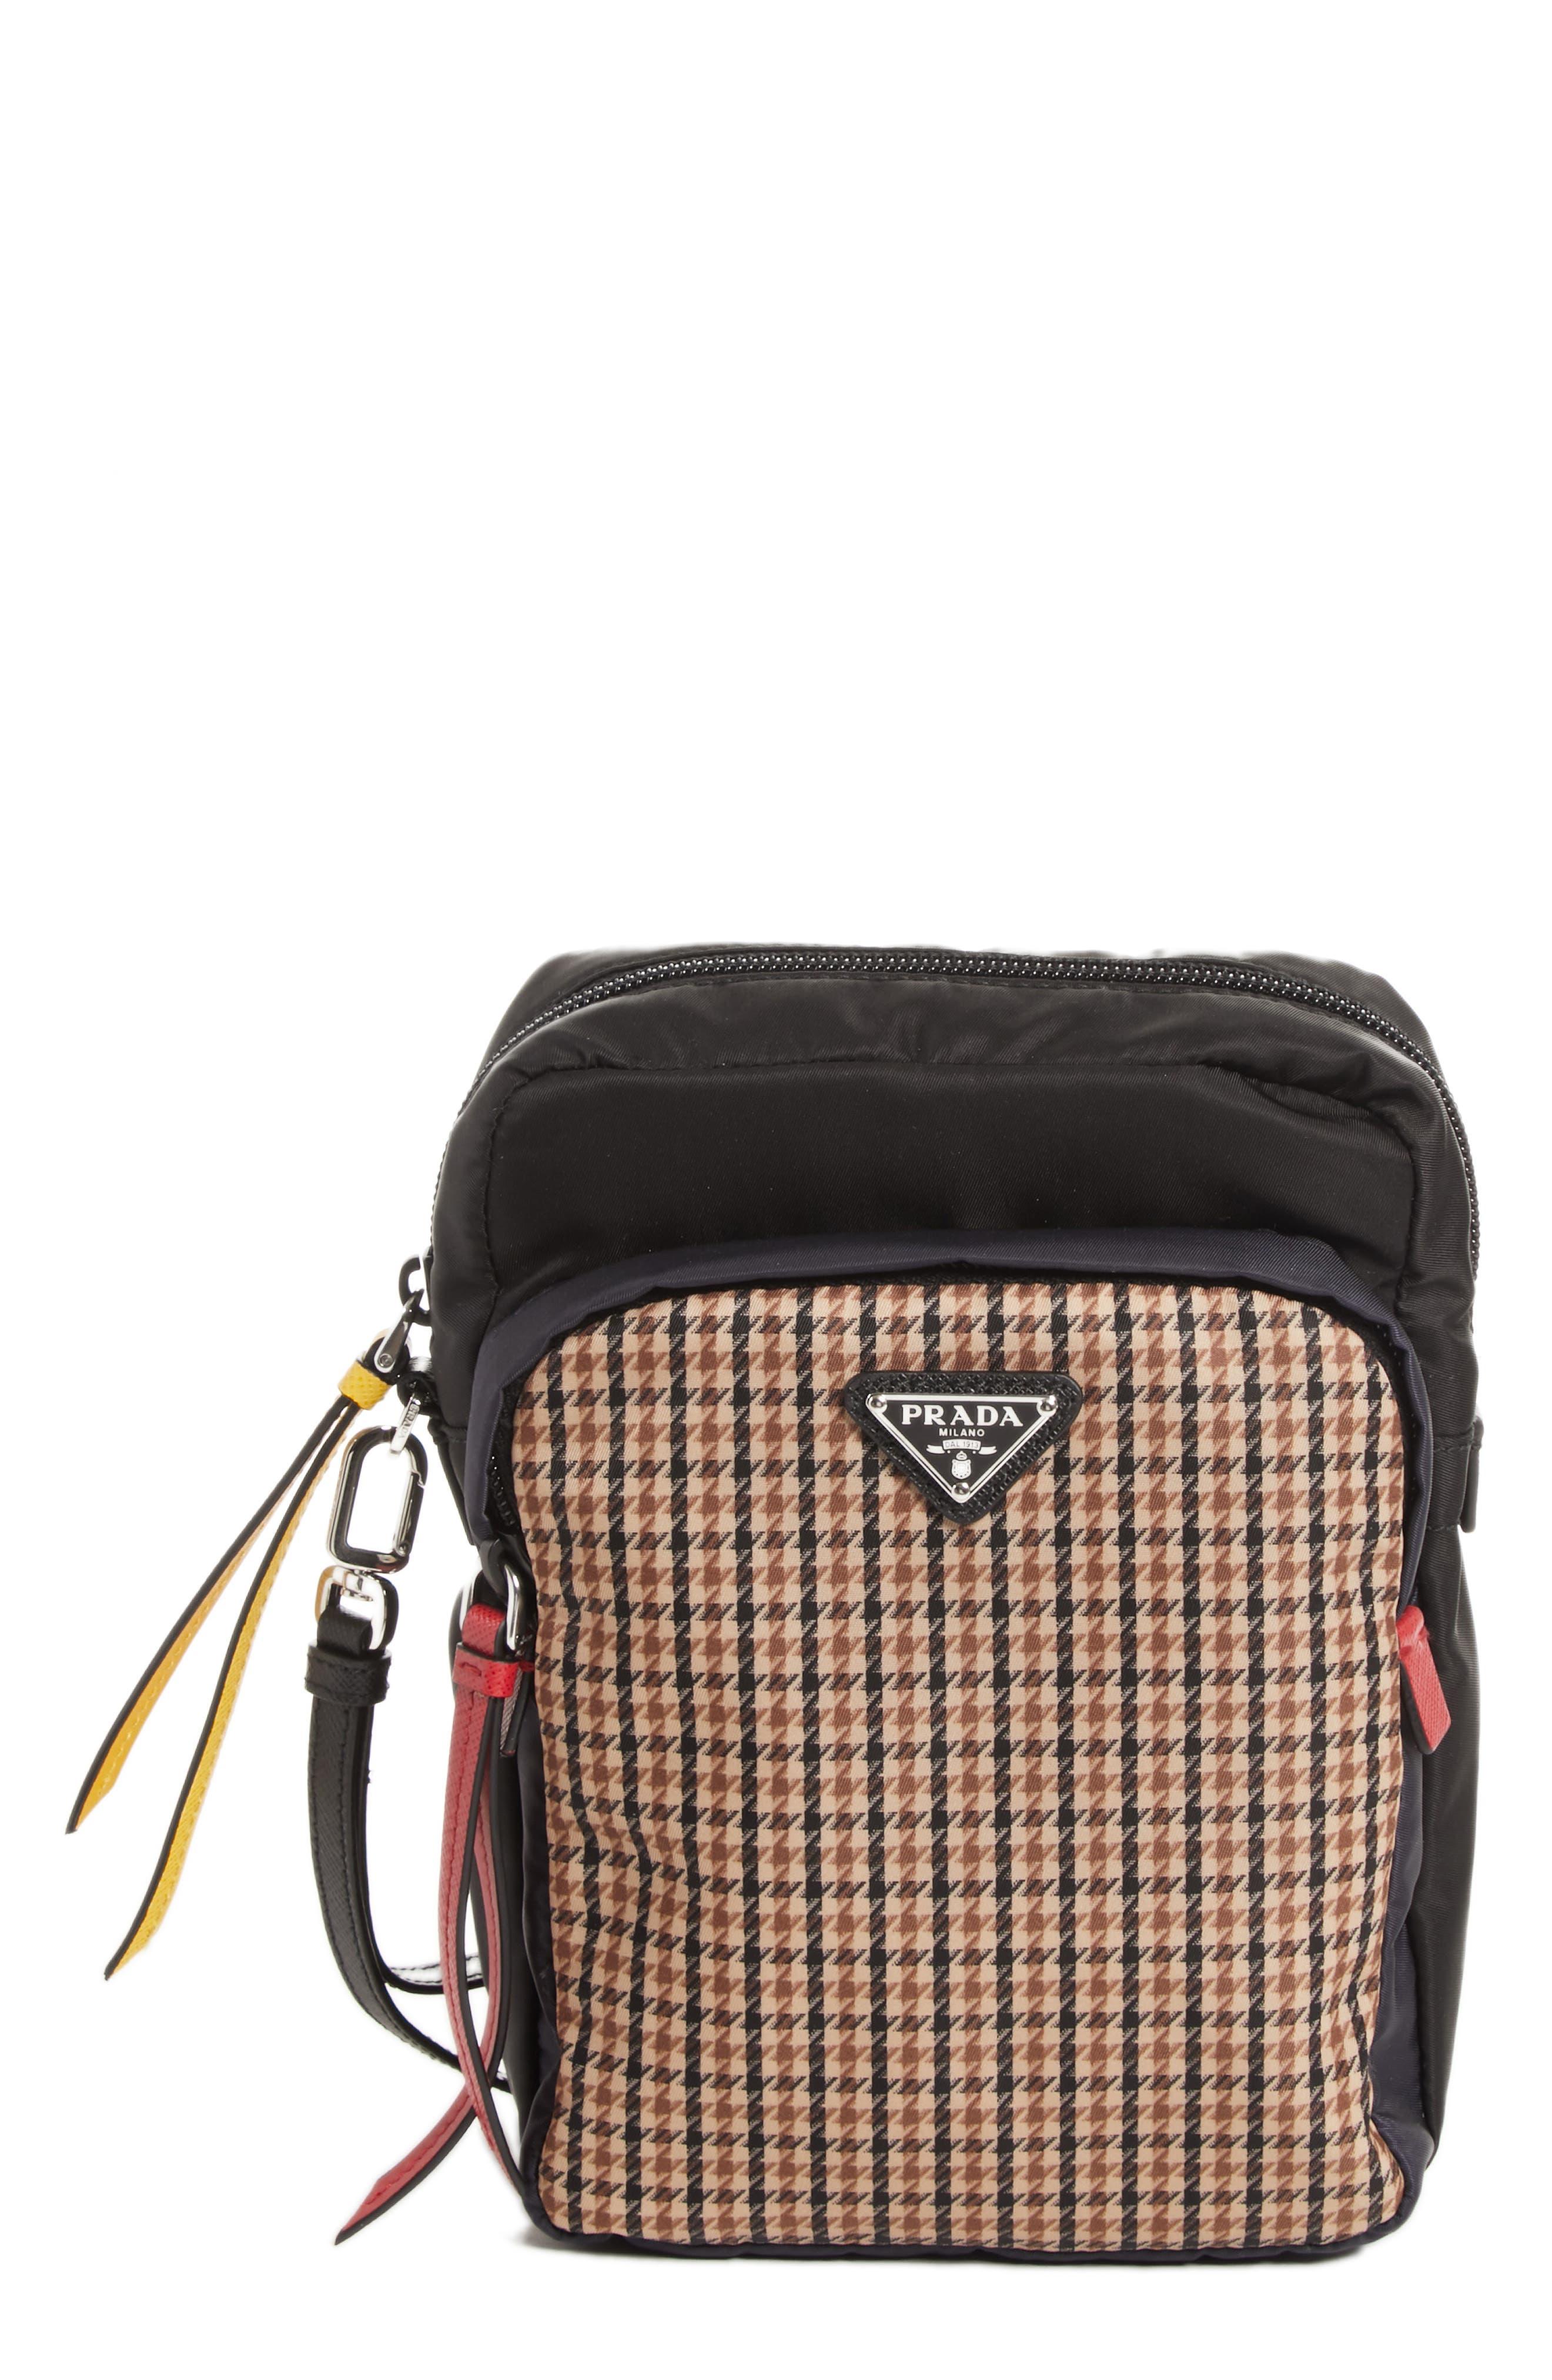 Tessudo Nylon Wrist Bag,                             Main thumbnail 1, color,                             CAMEL